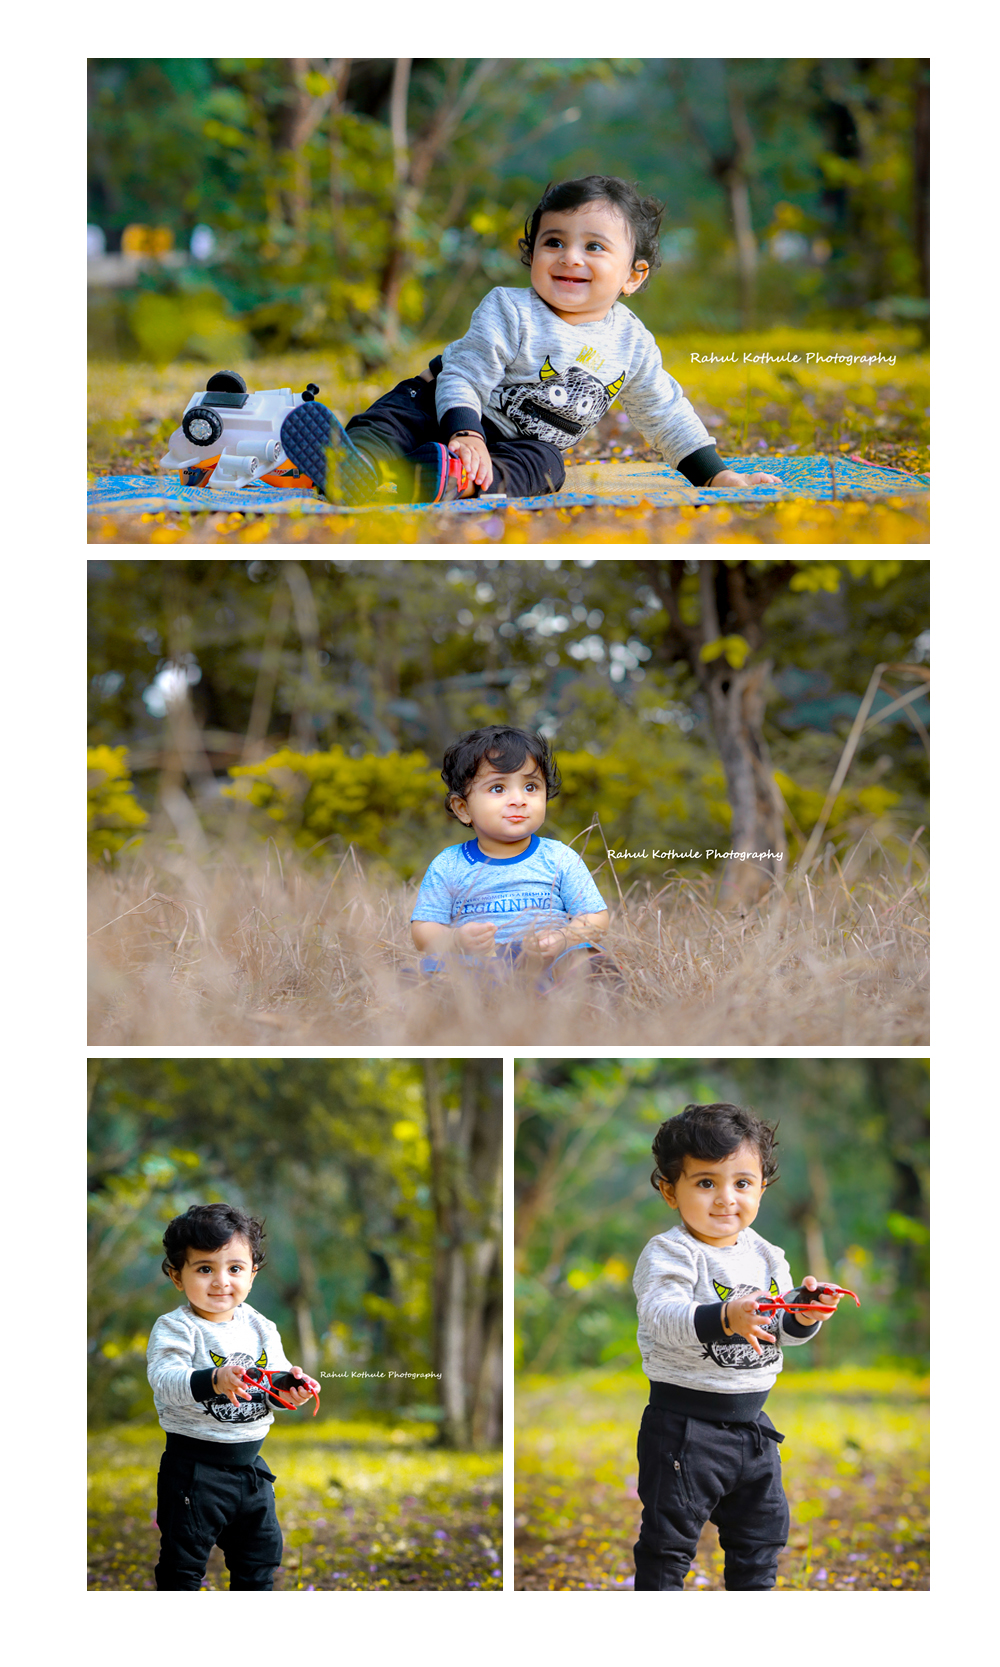 Rahul Kothule Photography Share Business Card